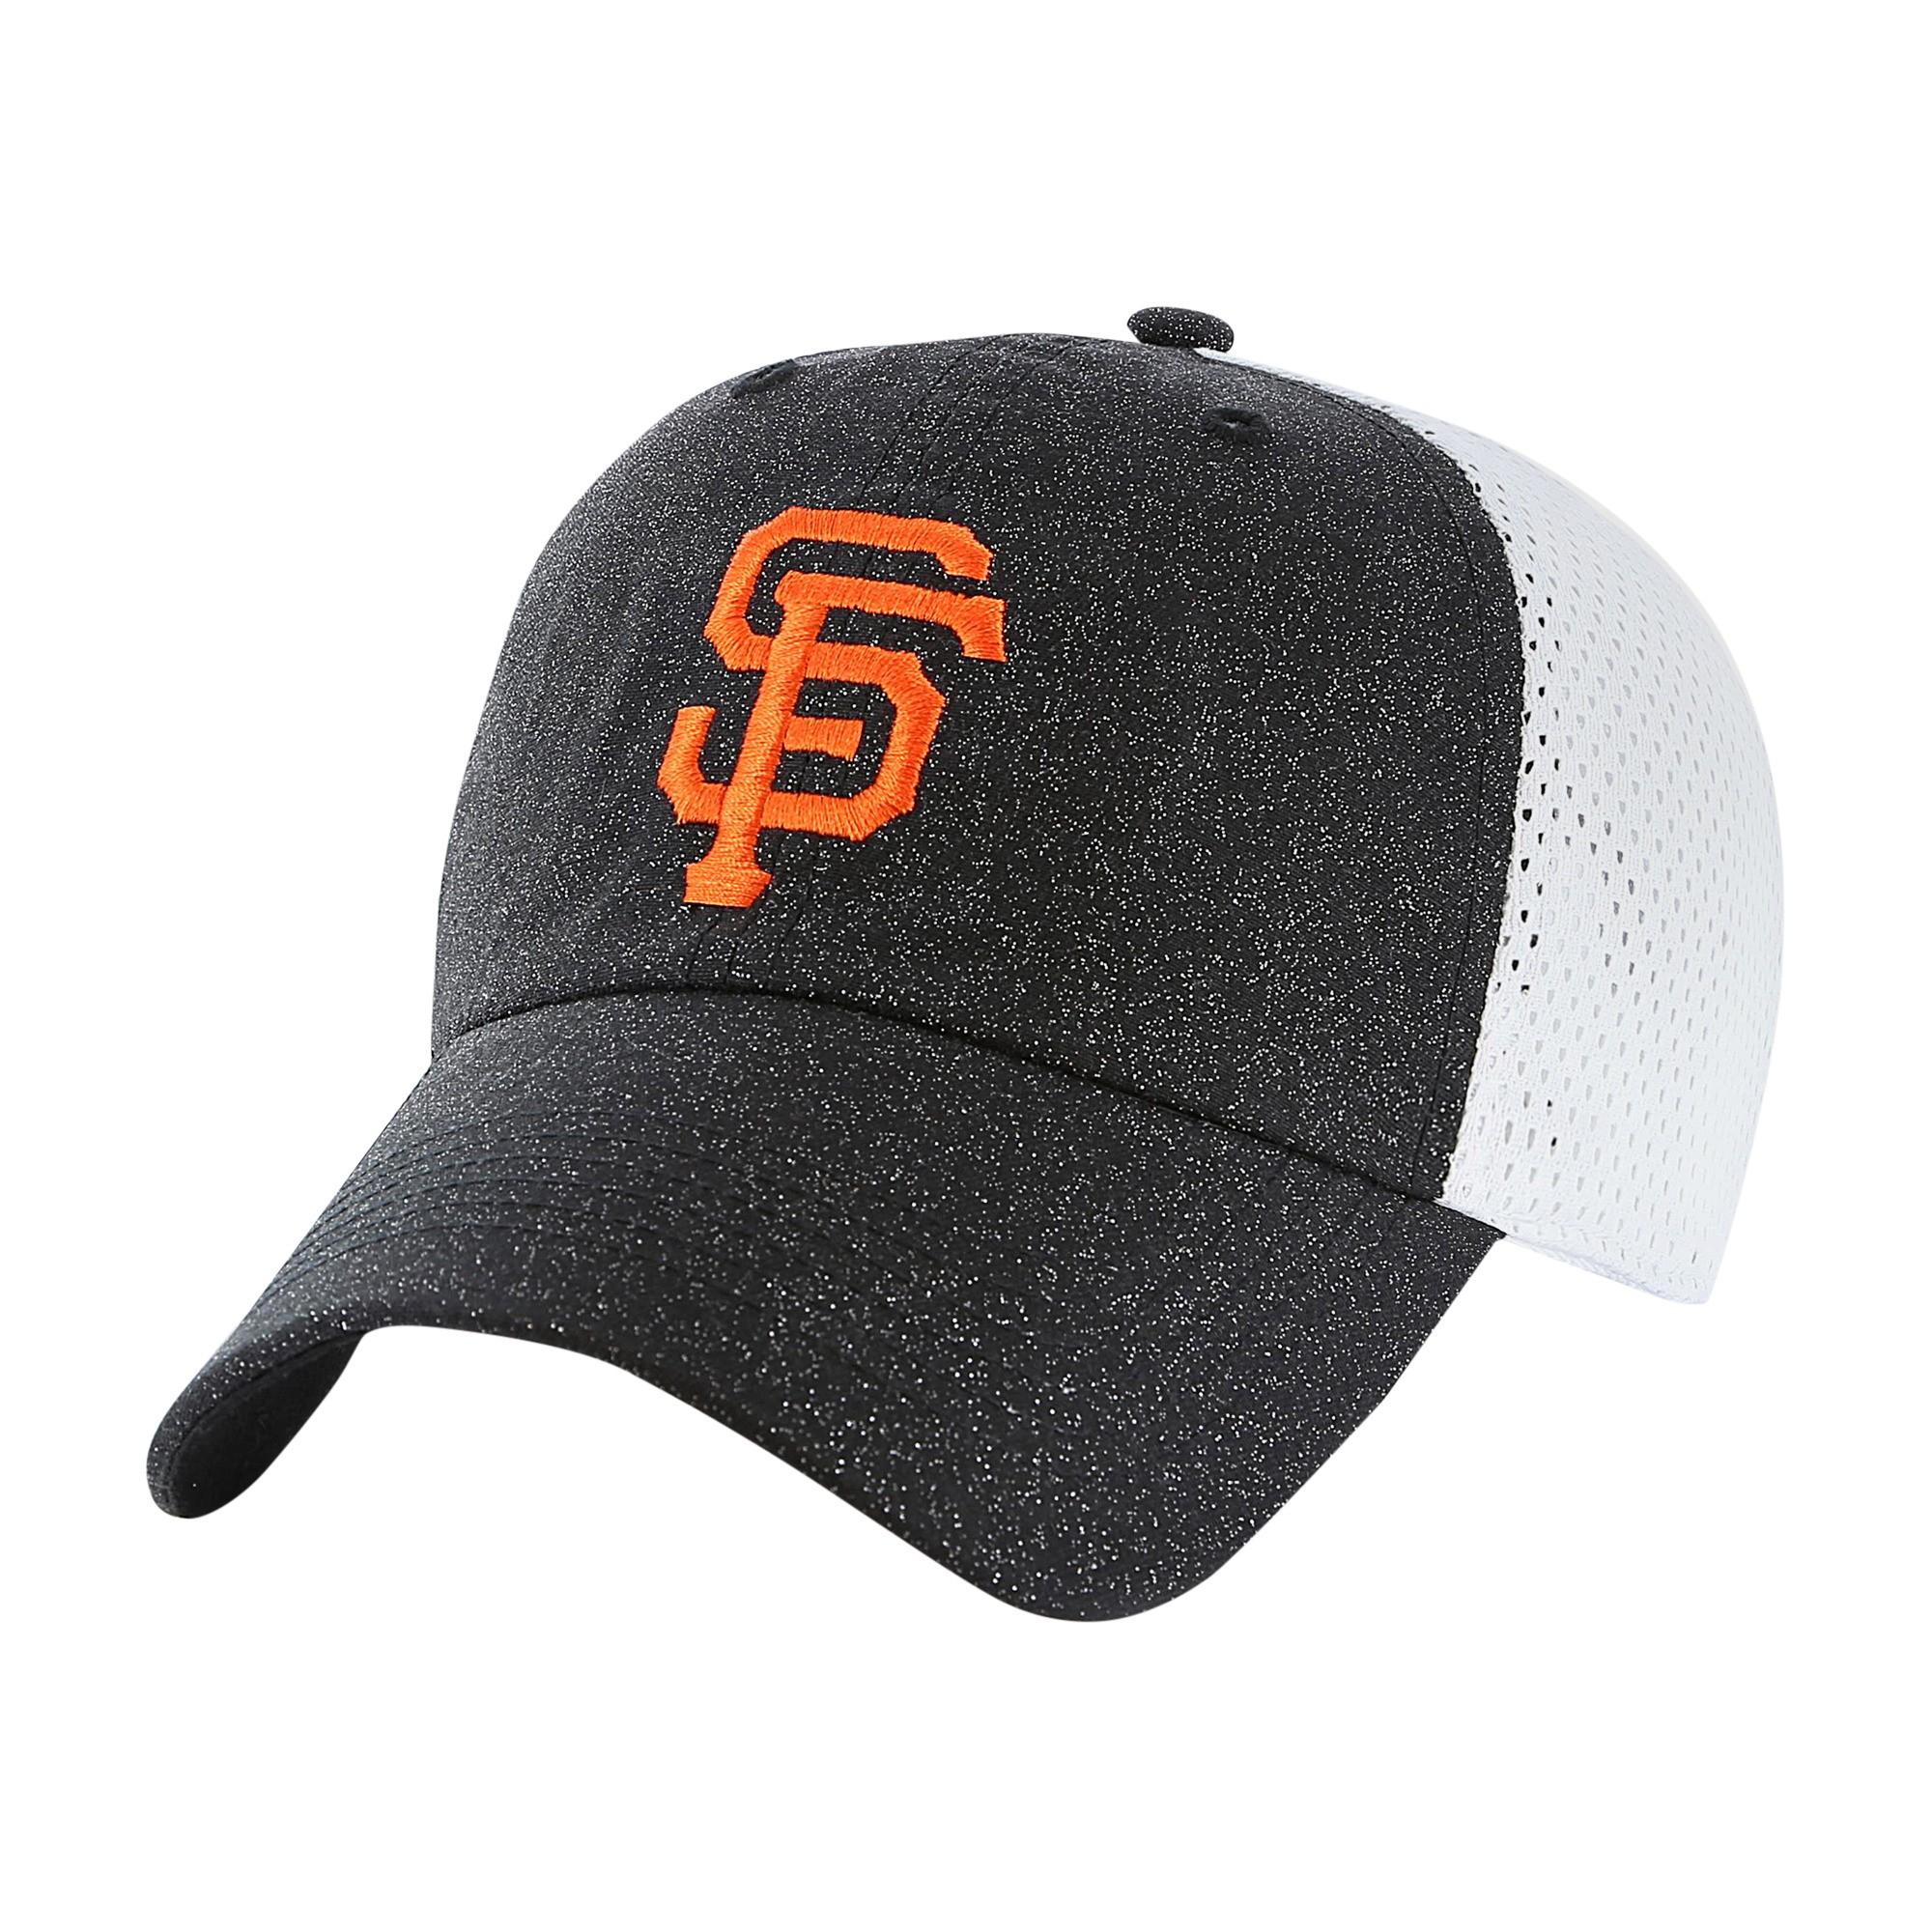 e534257e San Francisco Giants Fan Favorite Glitter Laner Women's Adjustable ...